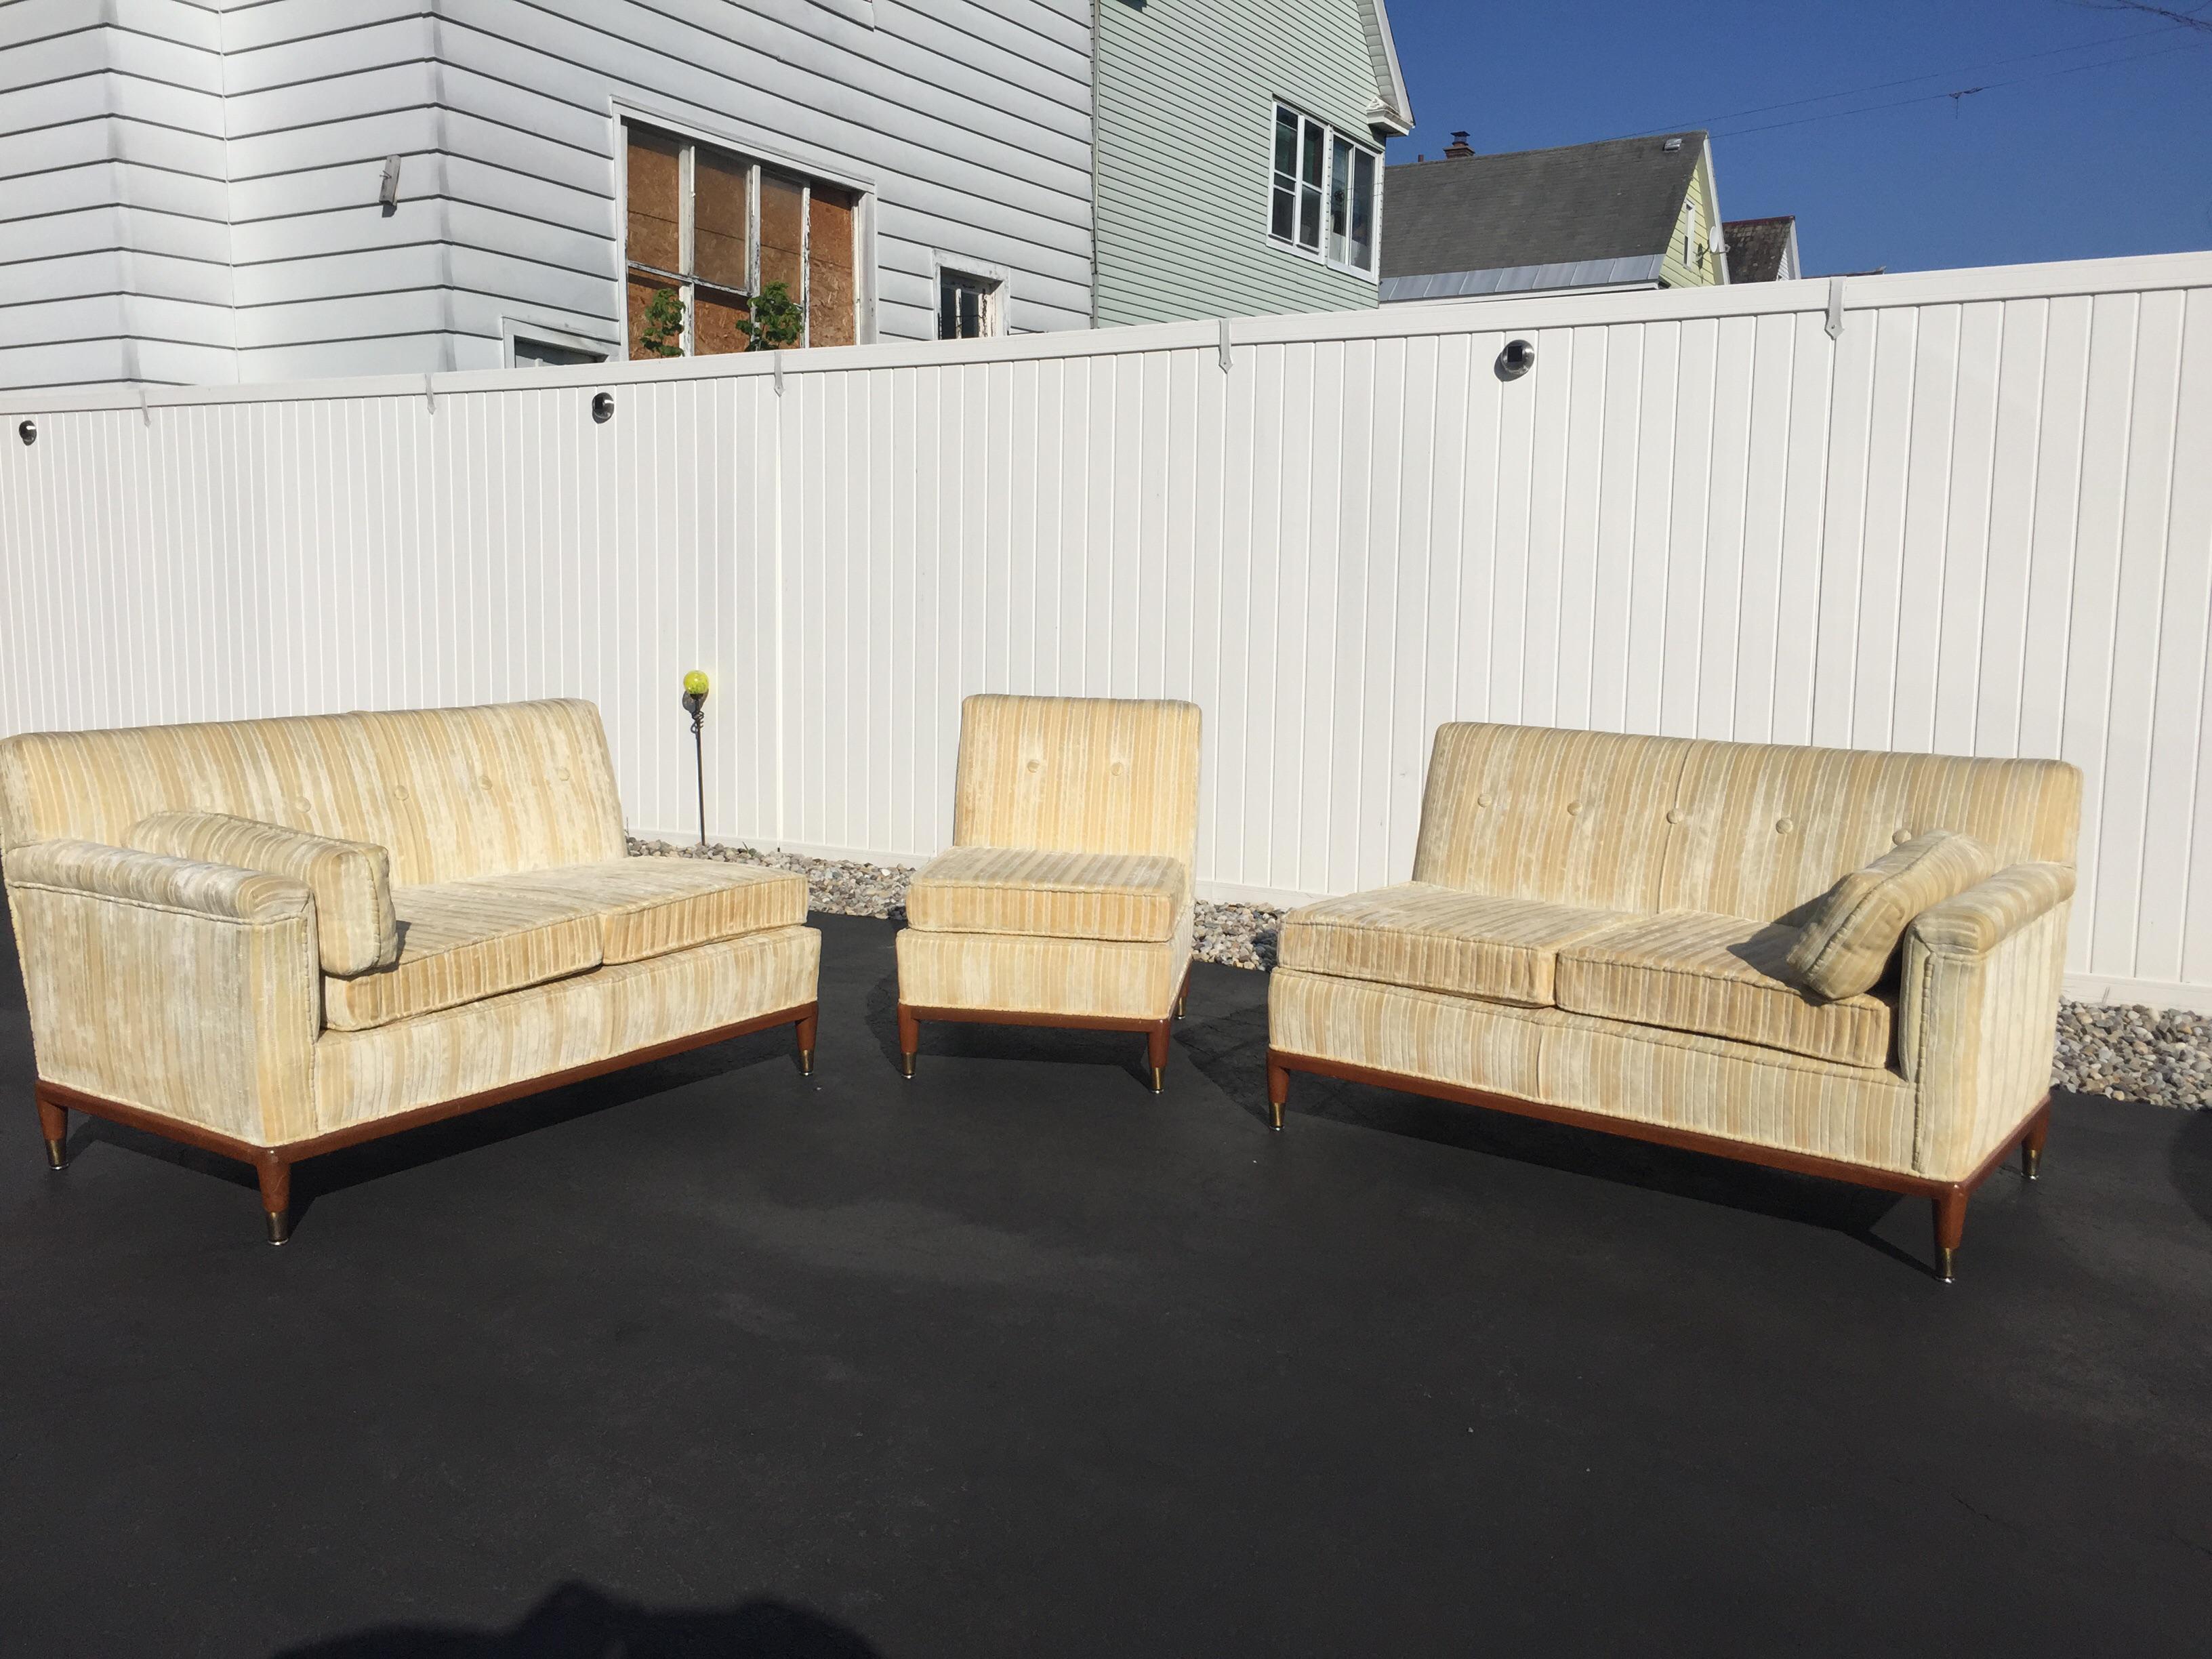 Attirant Mid Century Modern Striped Sectional Sofa   Set Of 3   Image 4 Of 11